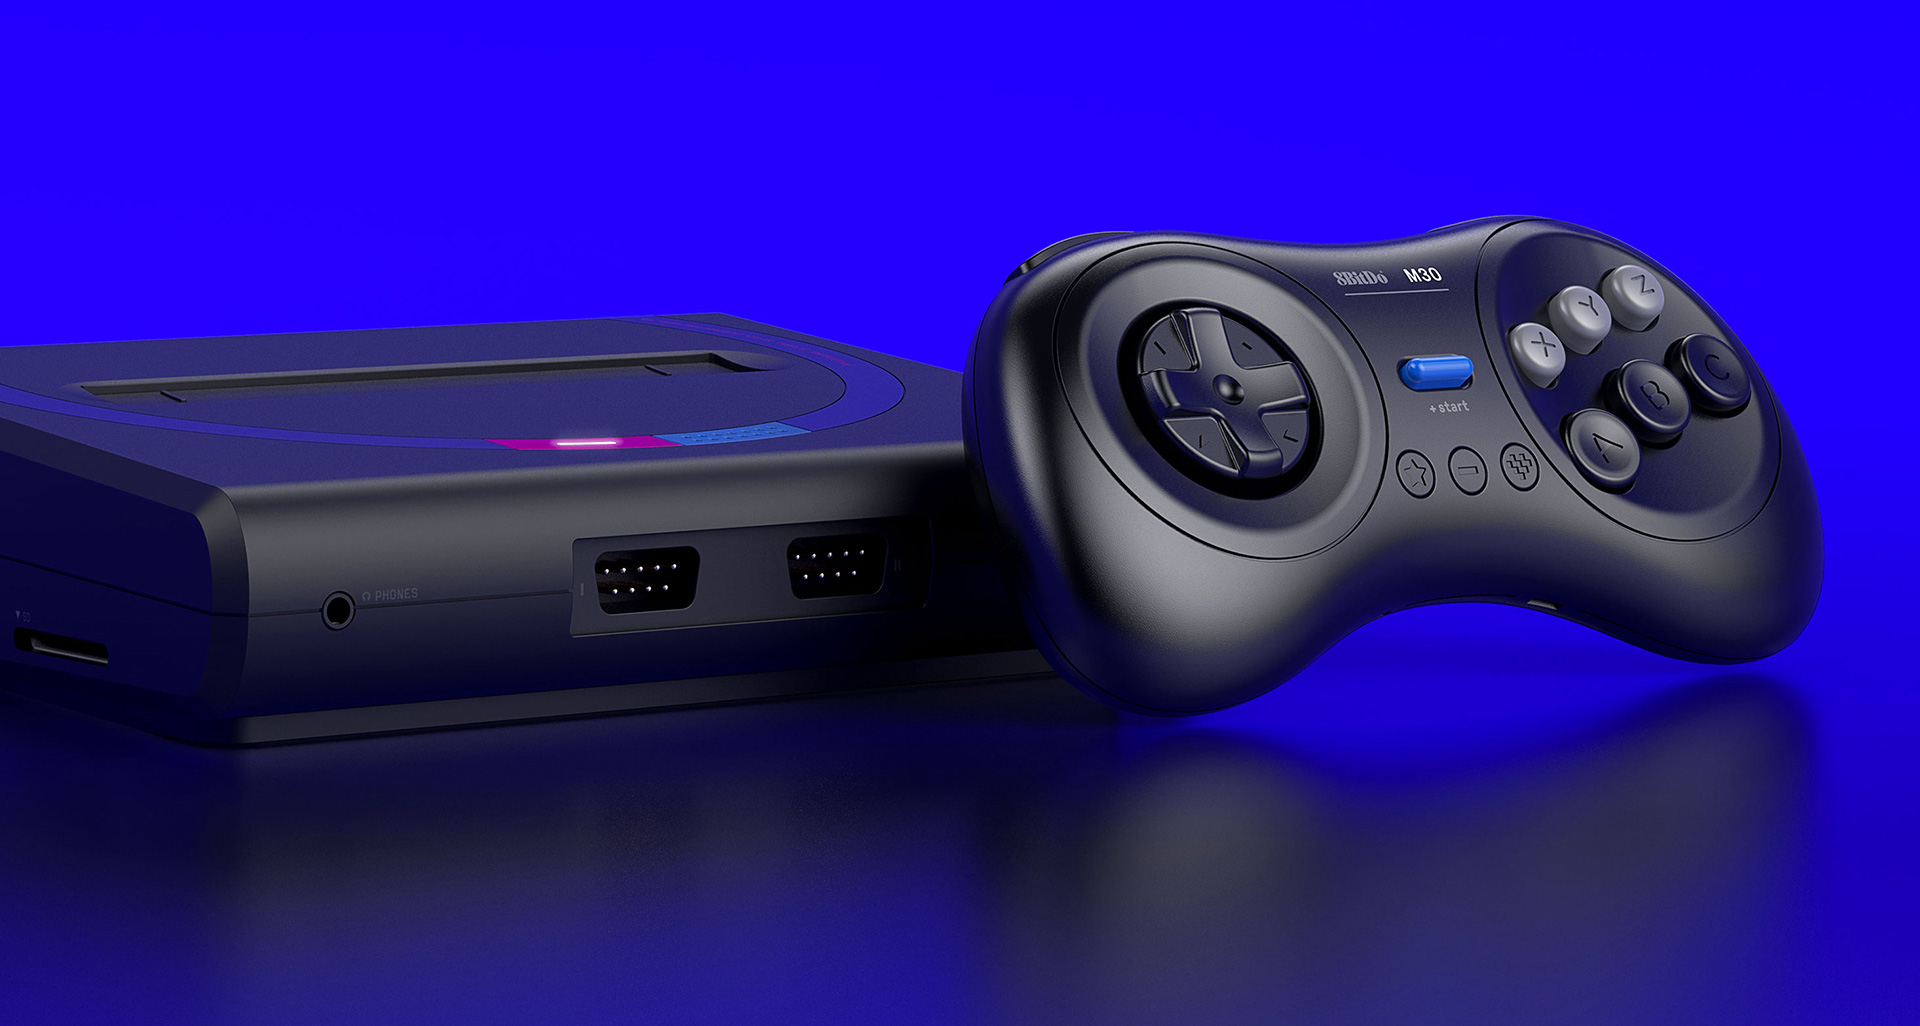 8BitDo's M30 controller for the Mega Sg